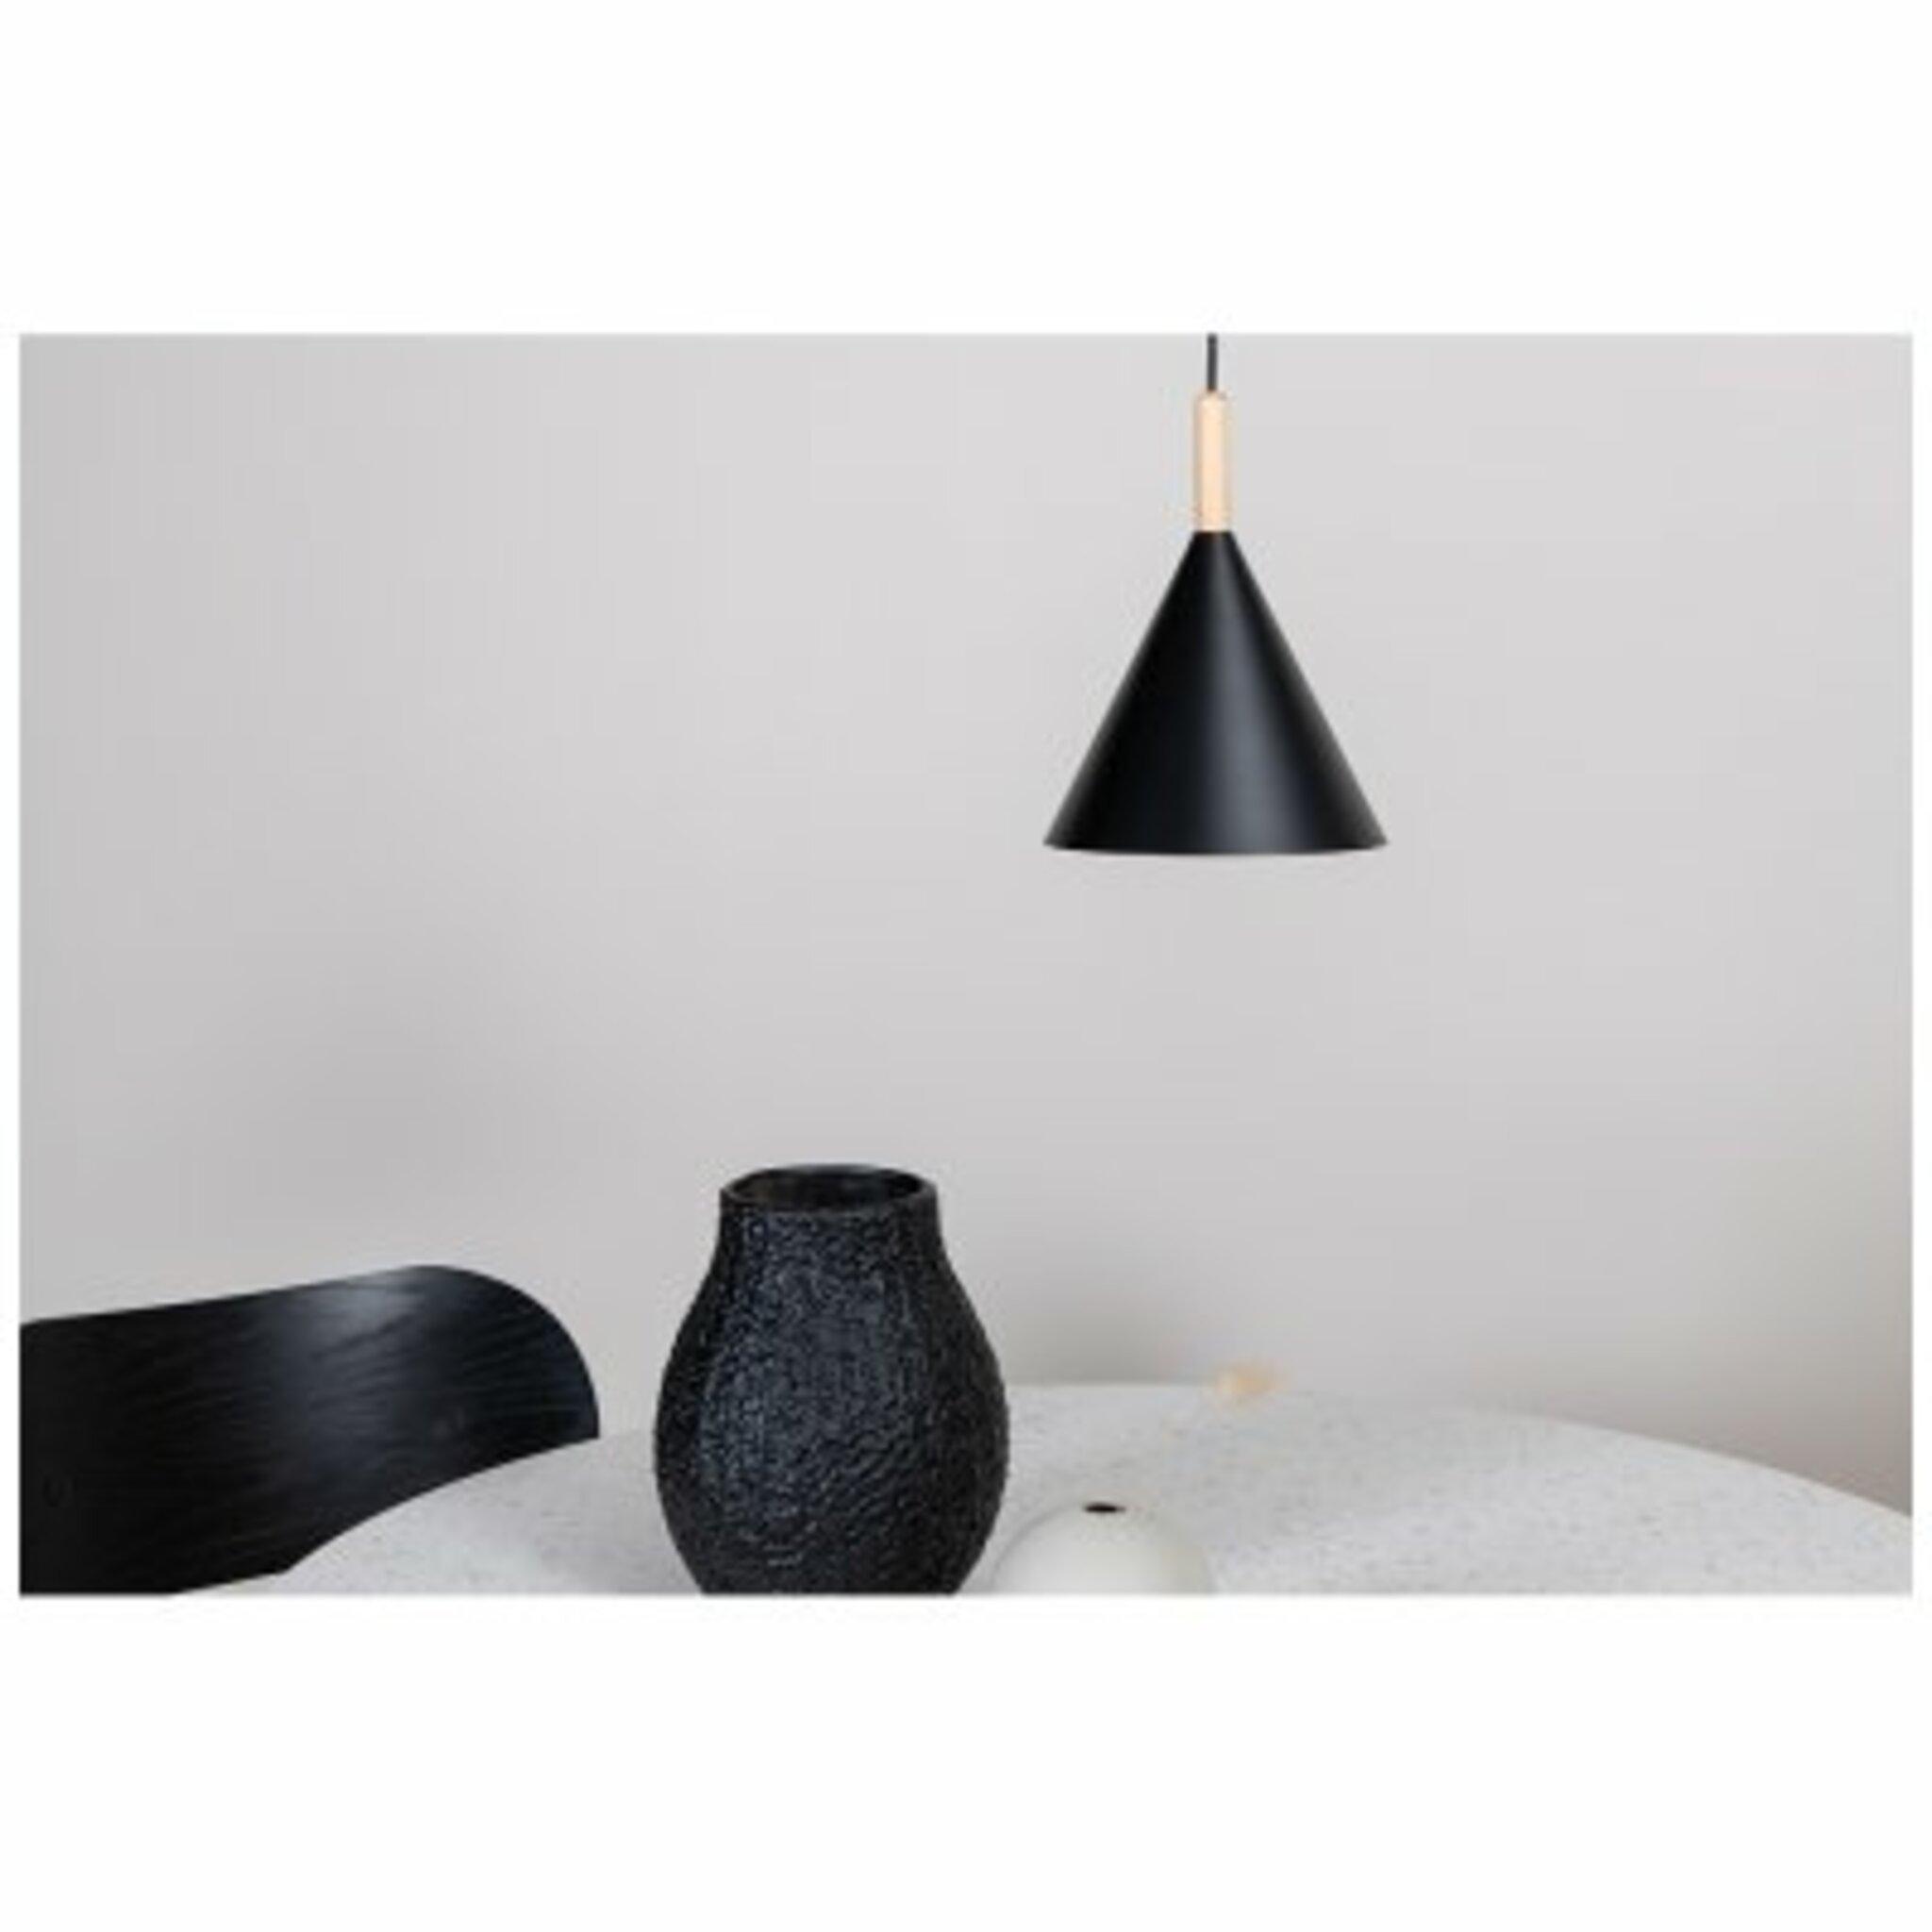 Taklampa Enif 20x26cm, svart/natur/trä